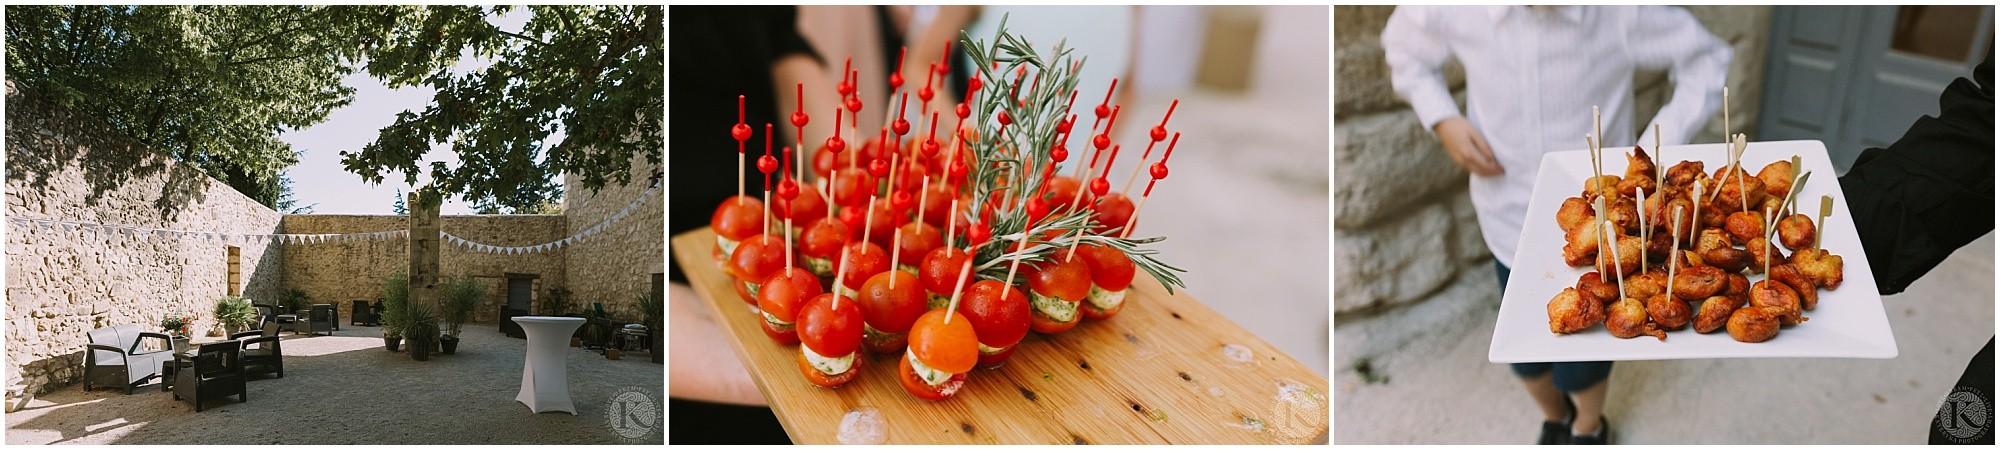 Kateryna-photos-photographe-mariage-vaucluse-provence-avignon-ferme-st-hugues_0065.jpg